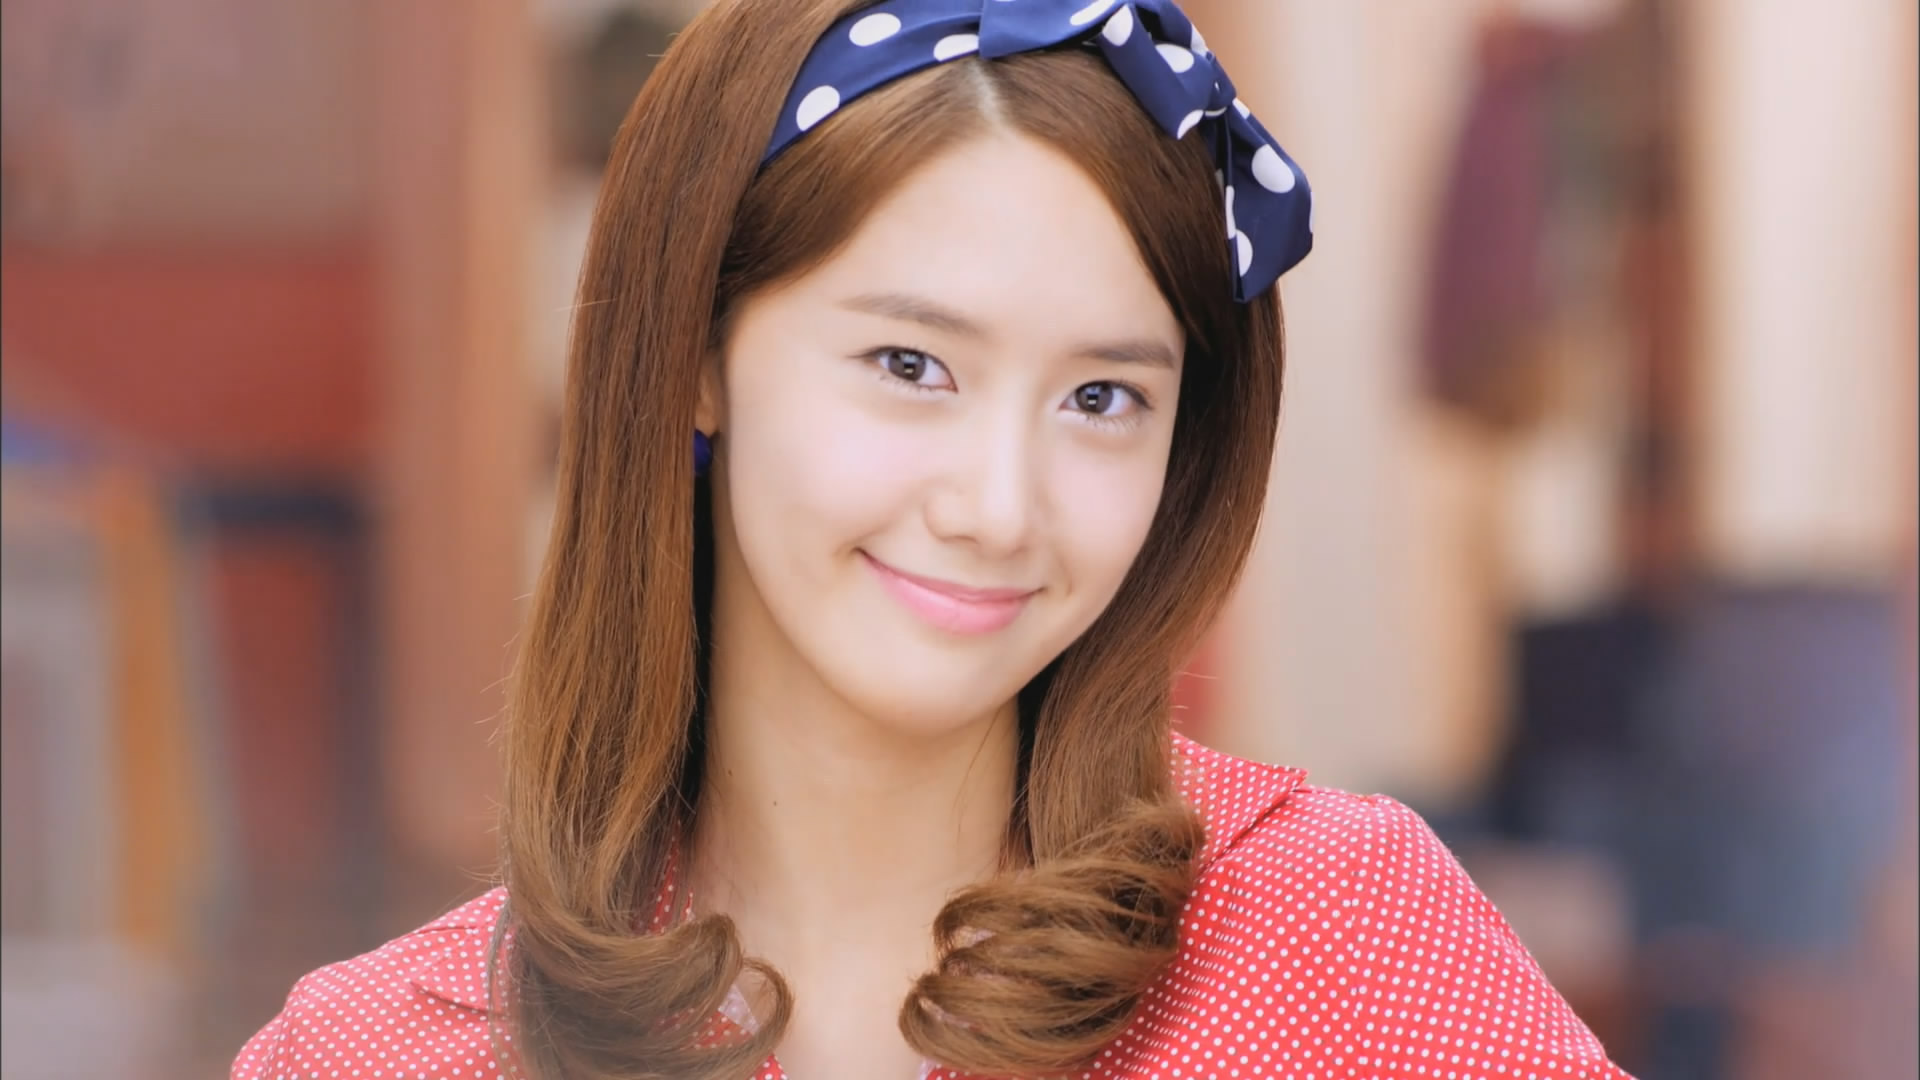 https://i2.wp.com/img.mi9.com/female-celebrities/5076/im-yoona_1920x1080_96225.jpg